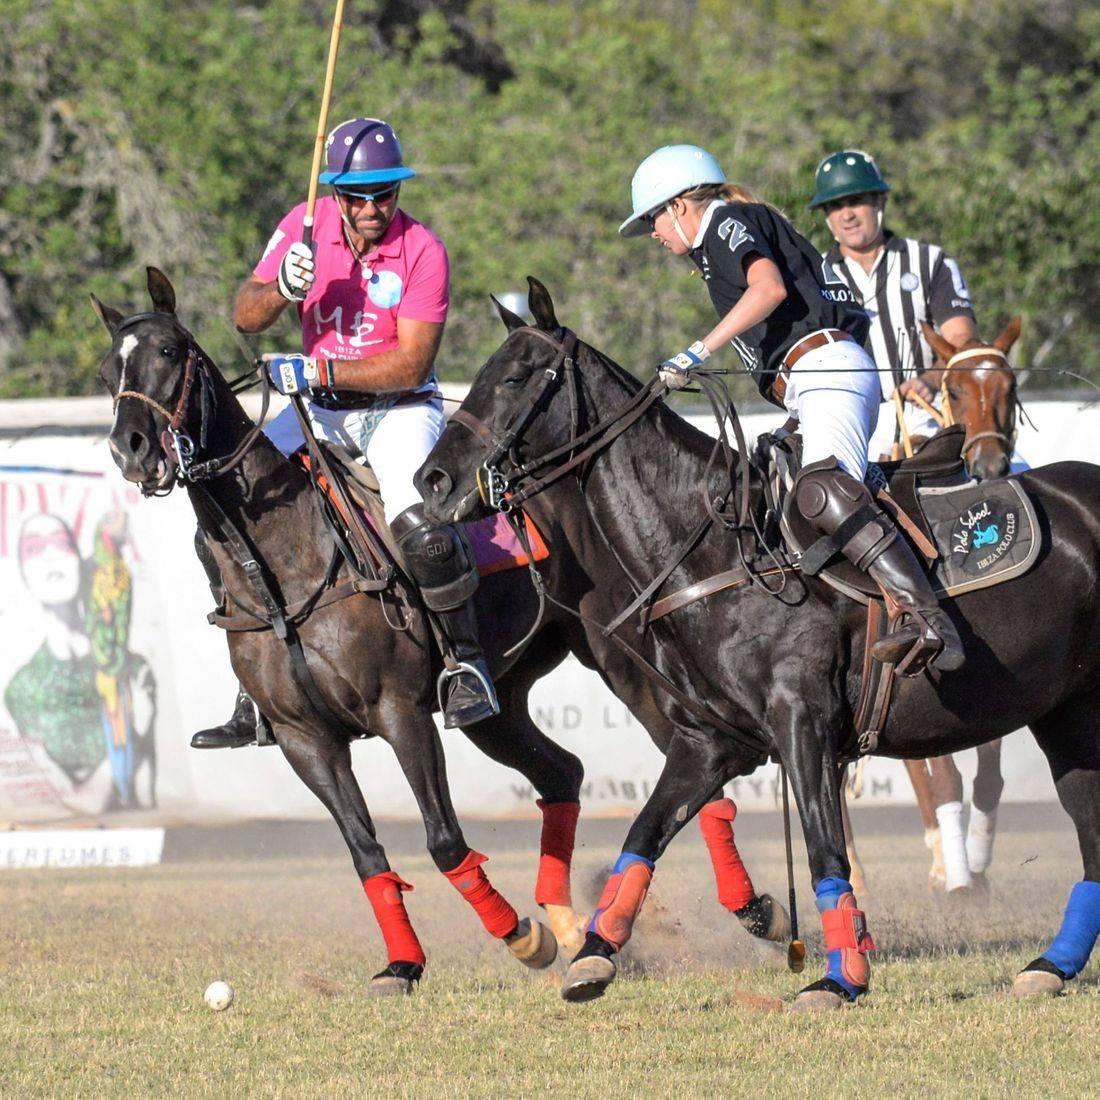 ibiza mountains, ibiza polo club, learn to play polo, spain polo, spain riding holiday